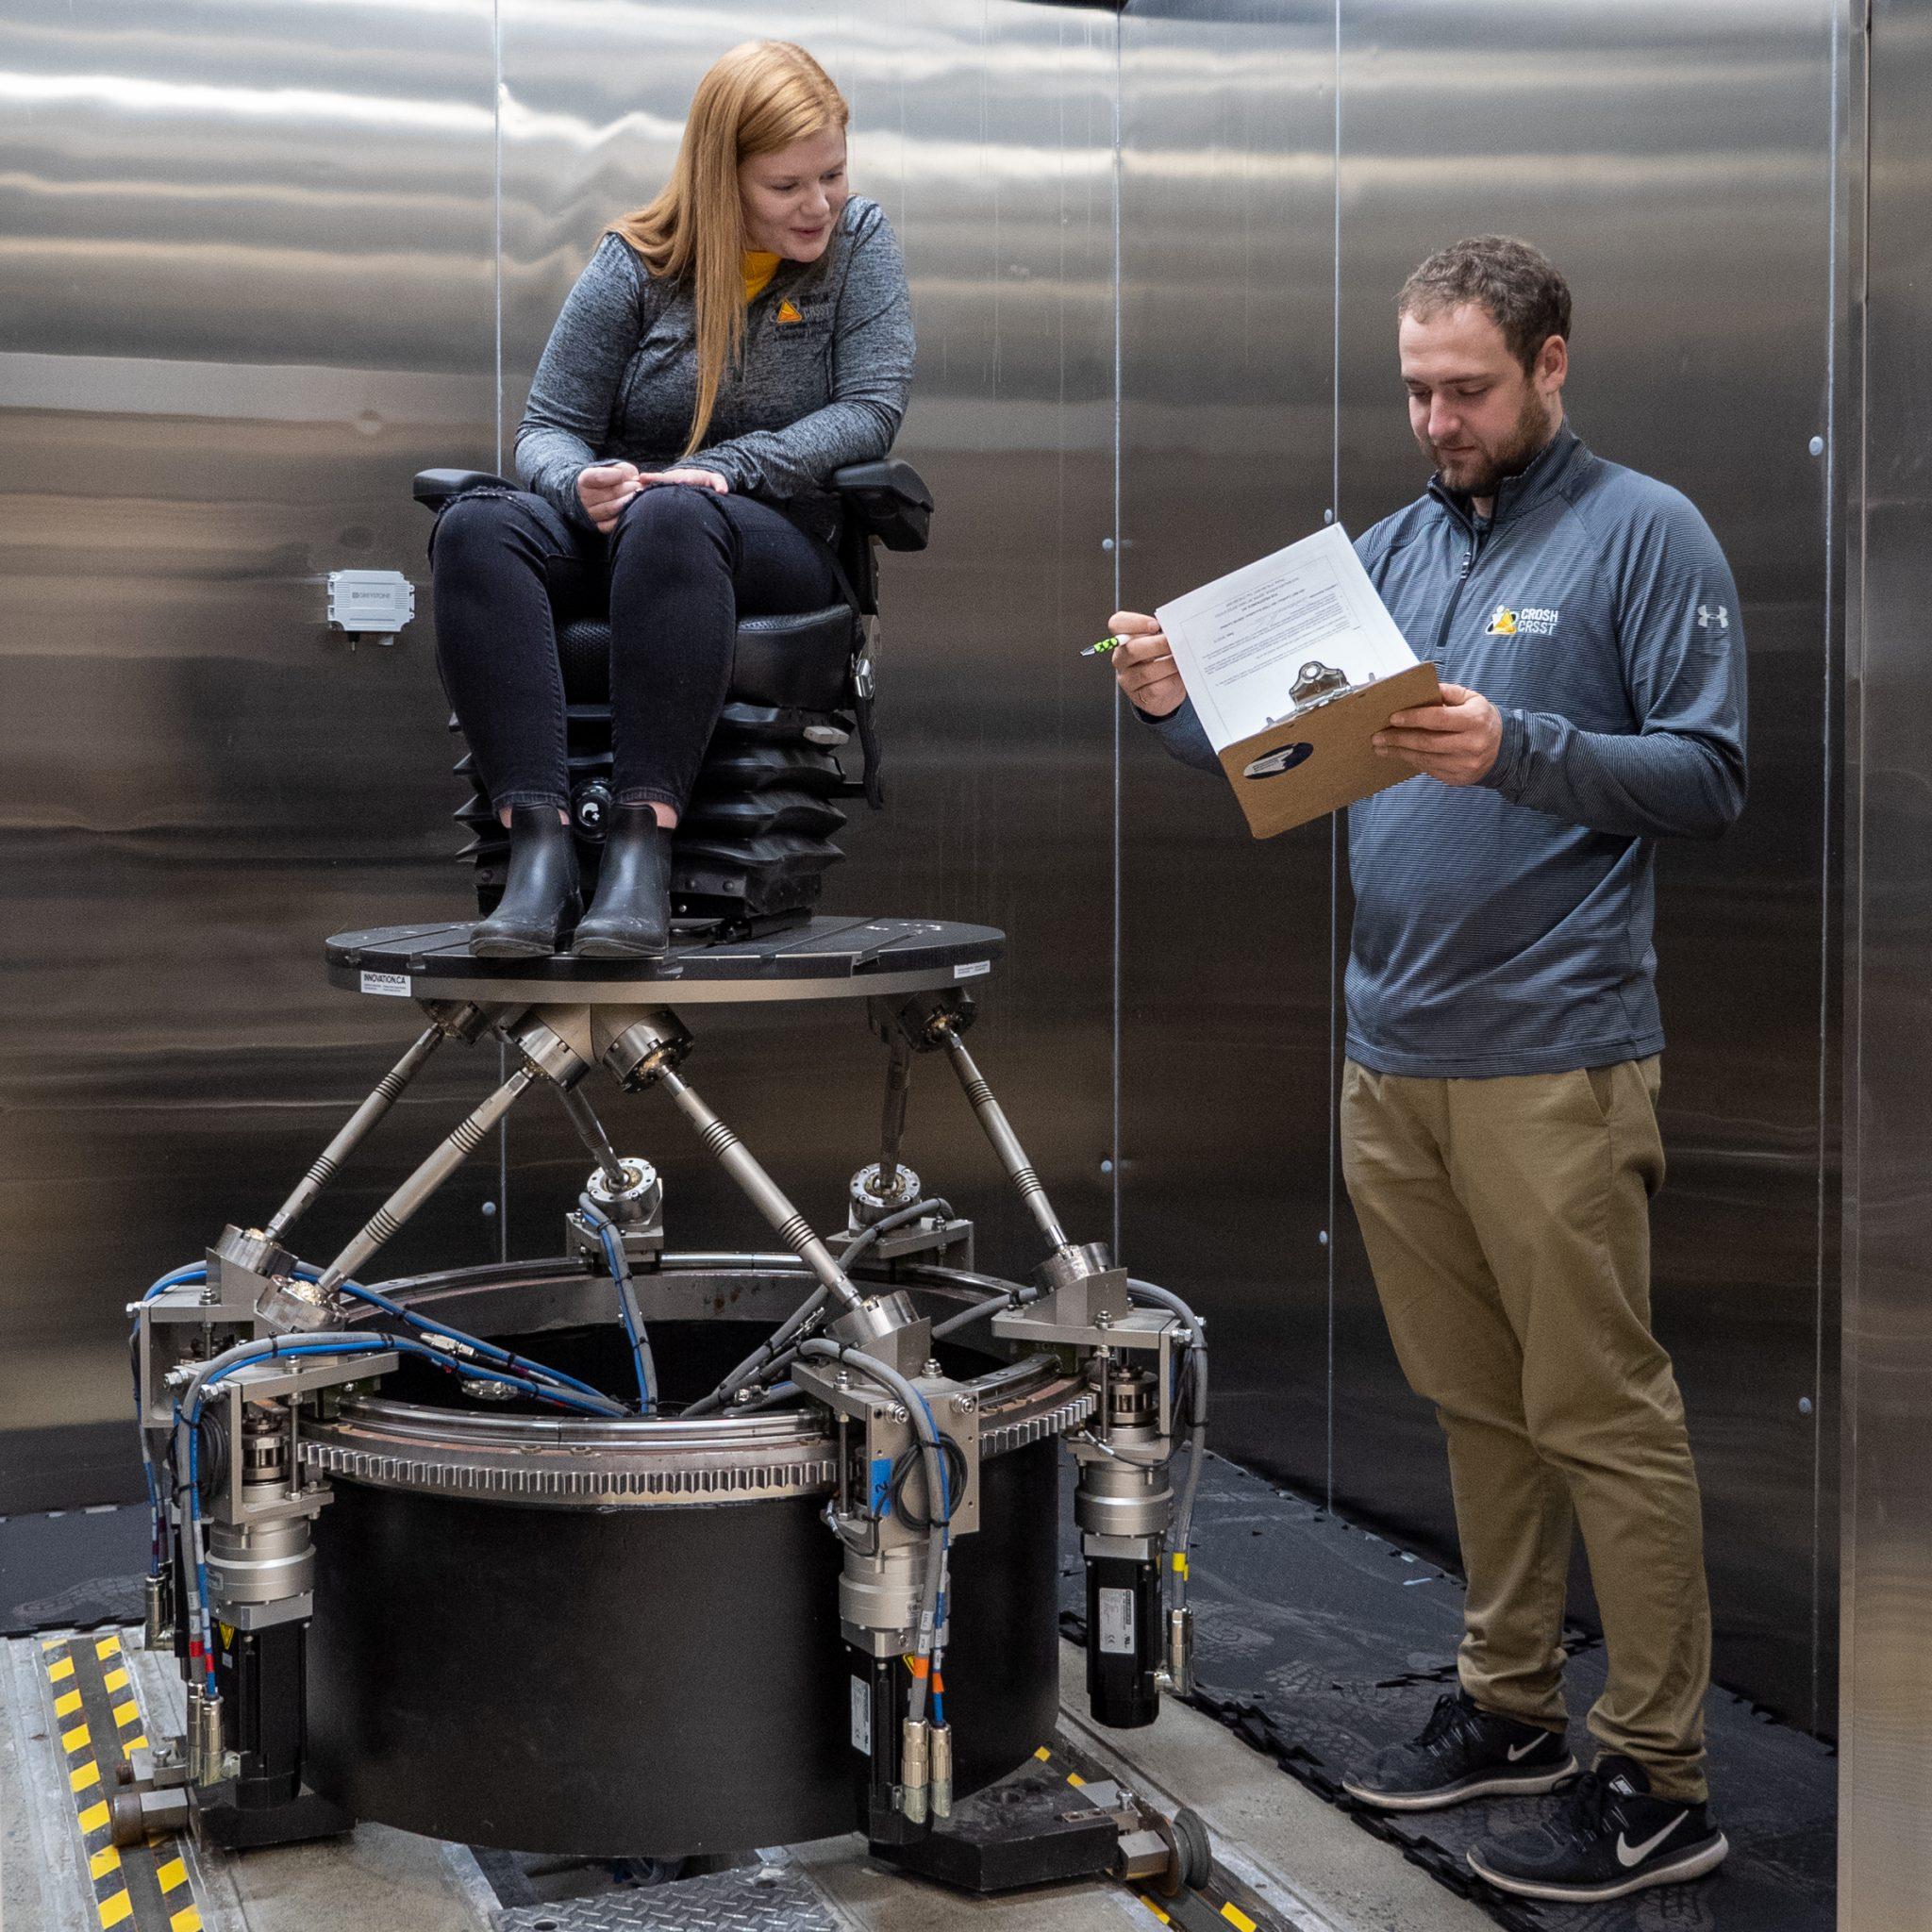 Researchers using the W-SIM robotic platform